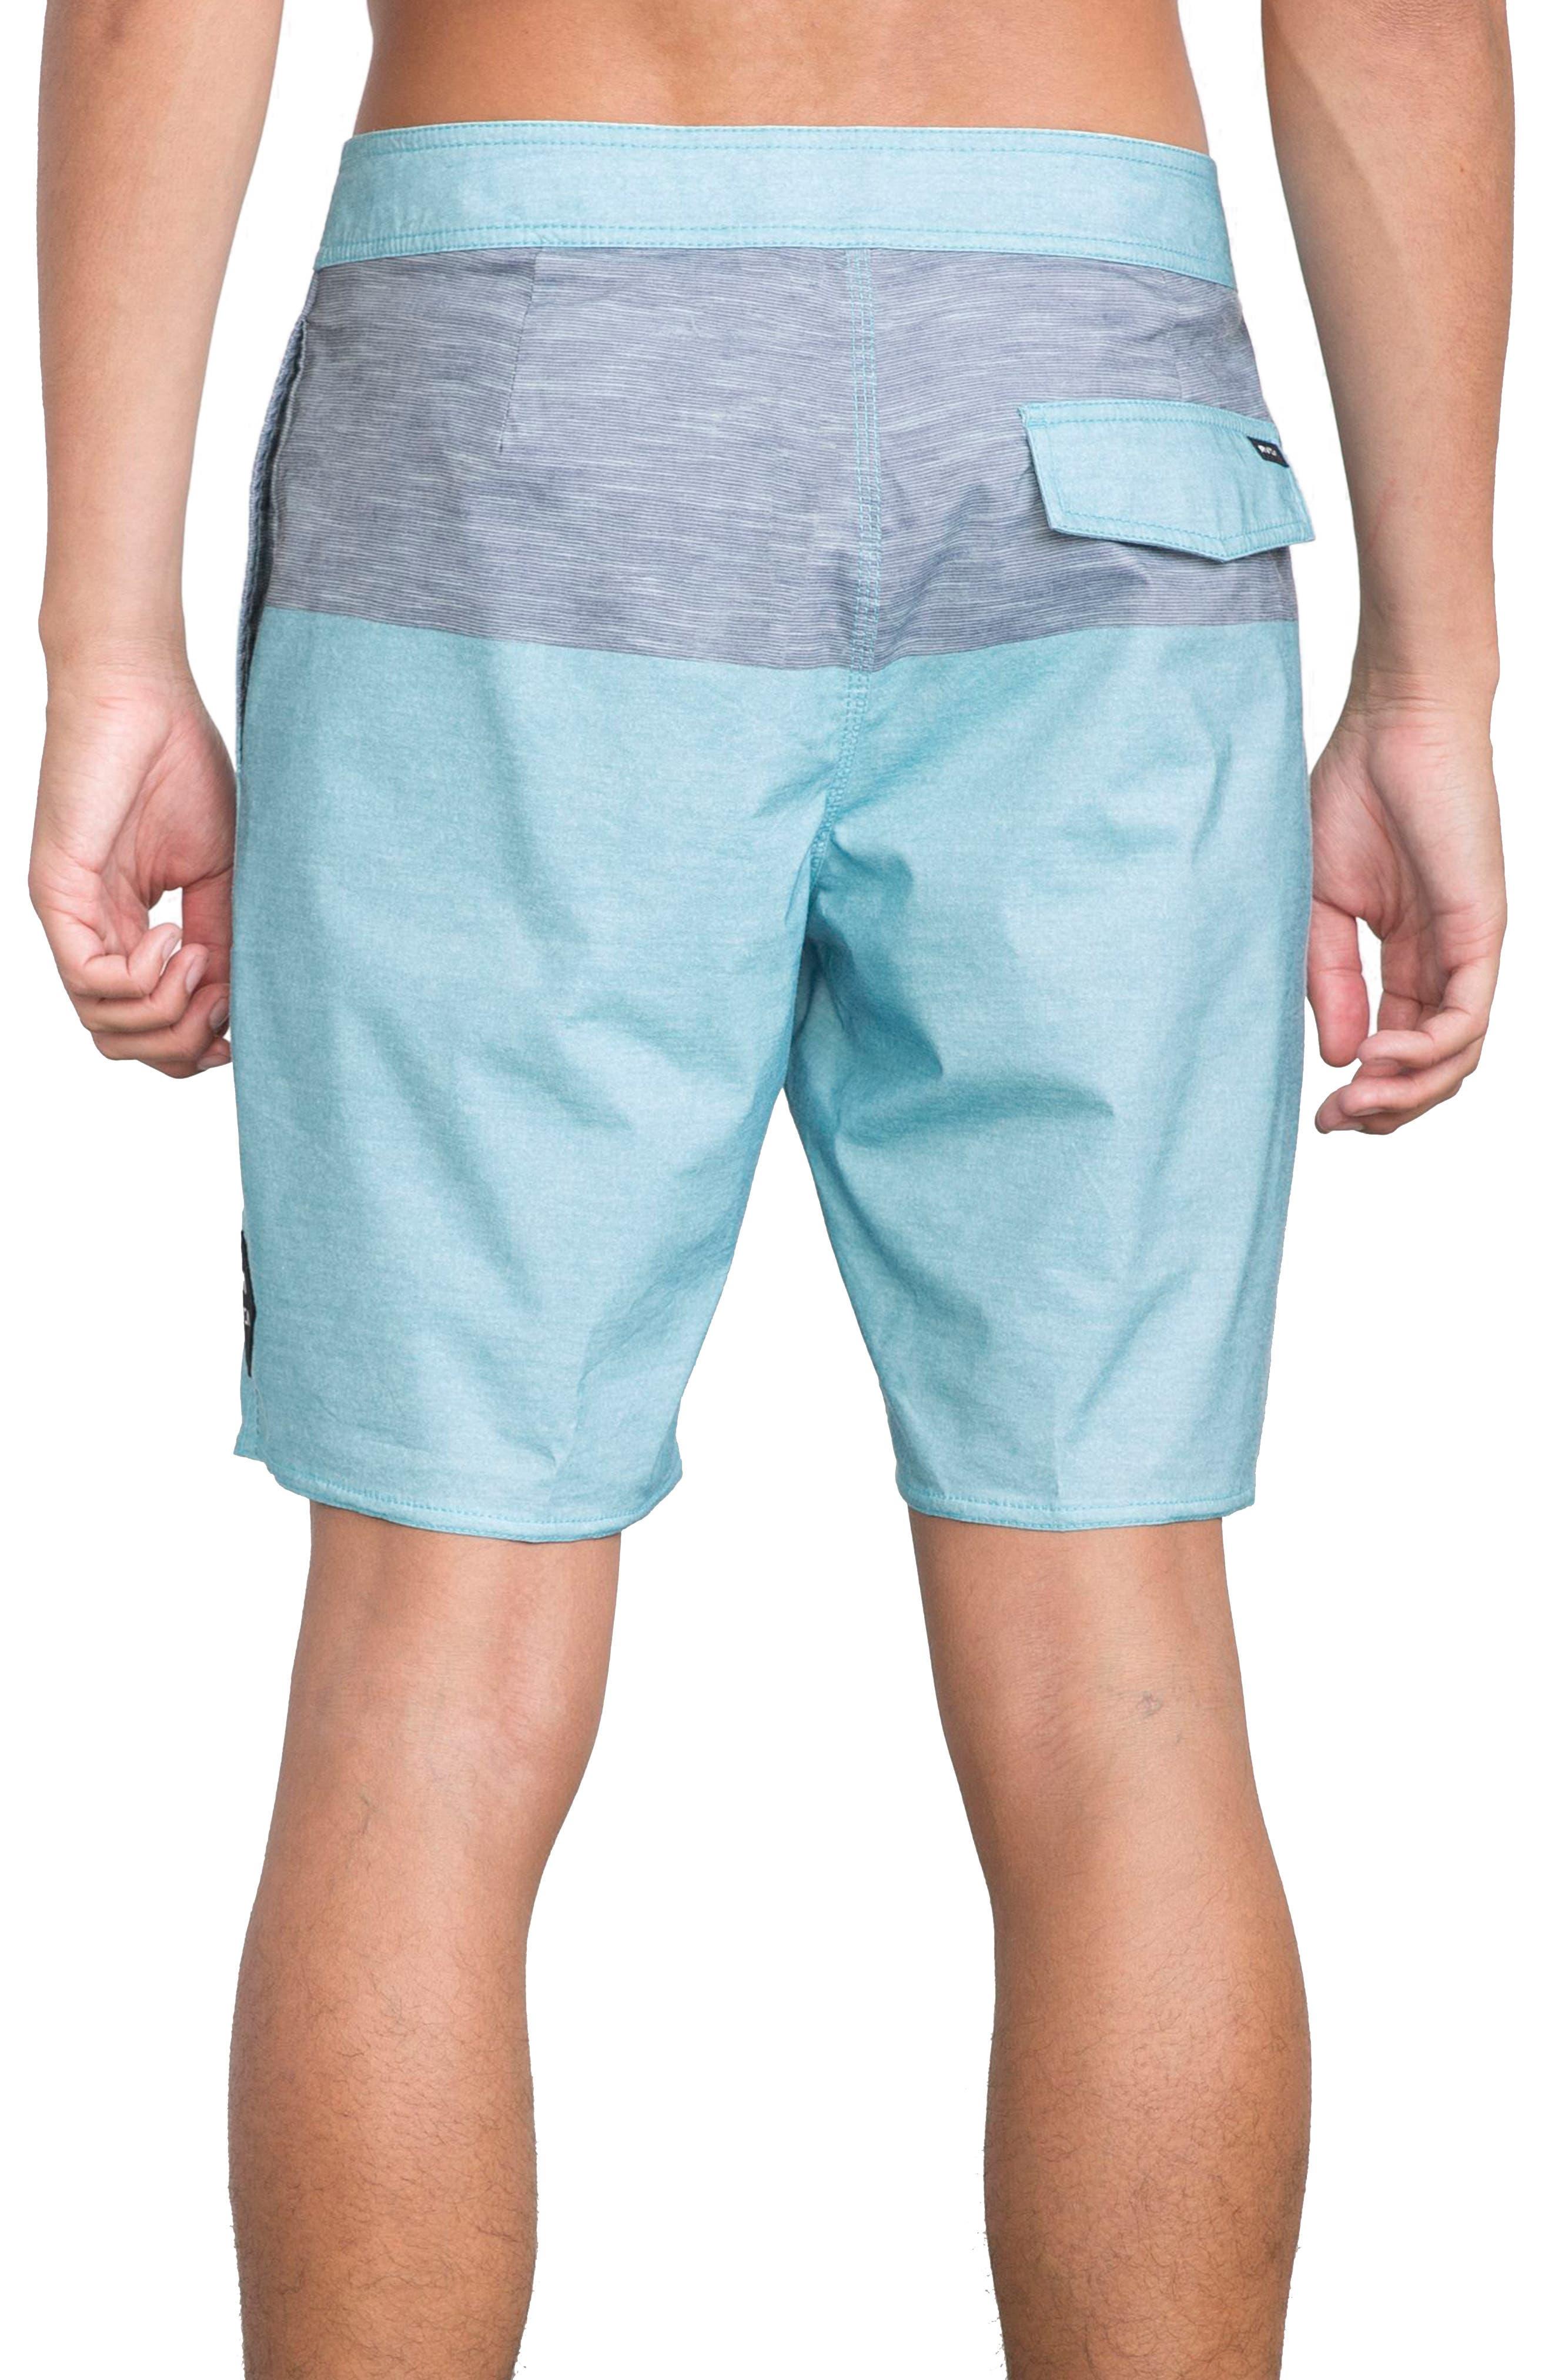 Gothard Board Shorts,                             Alternate thumbnail 2, color,                             MAUI BLUE